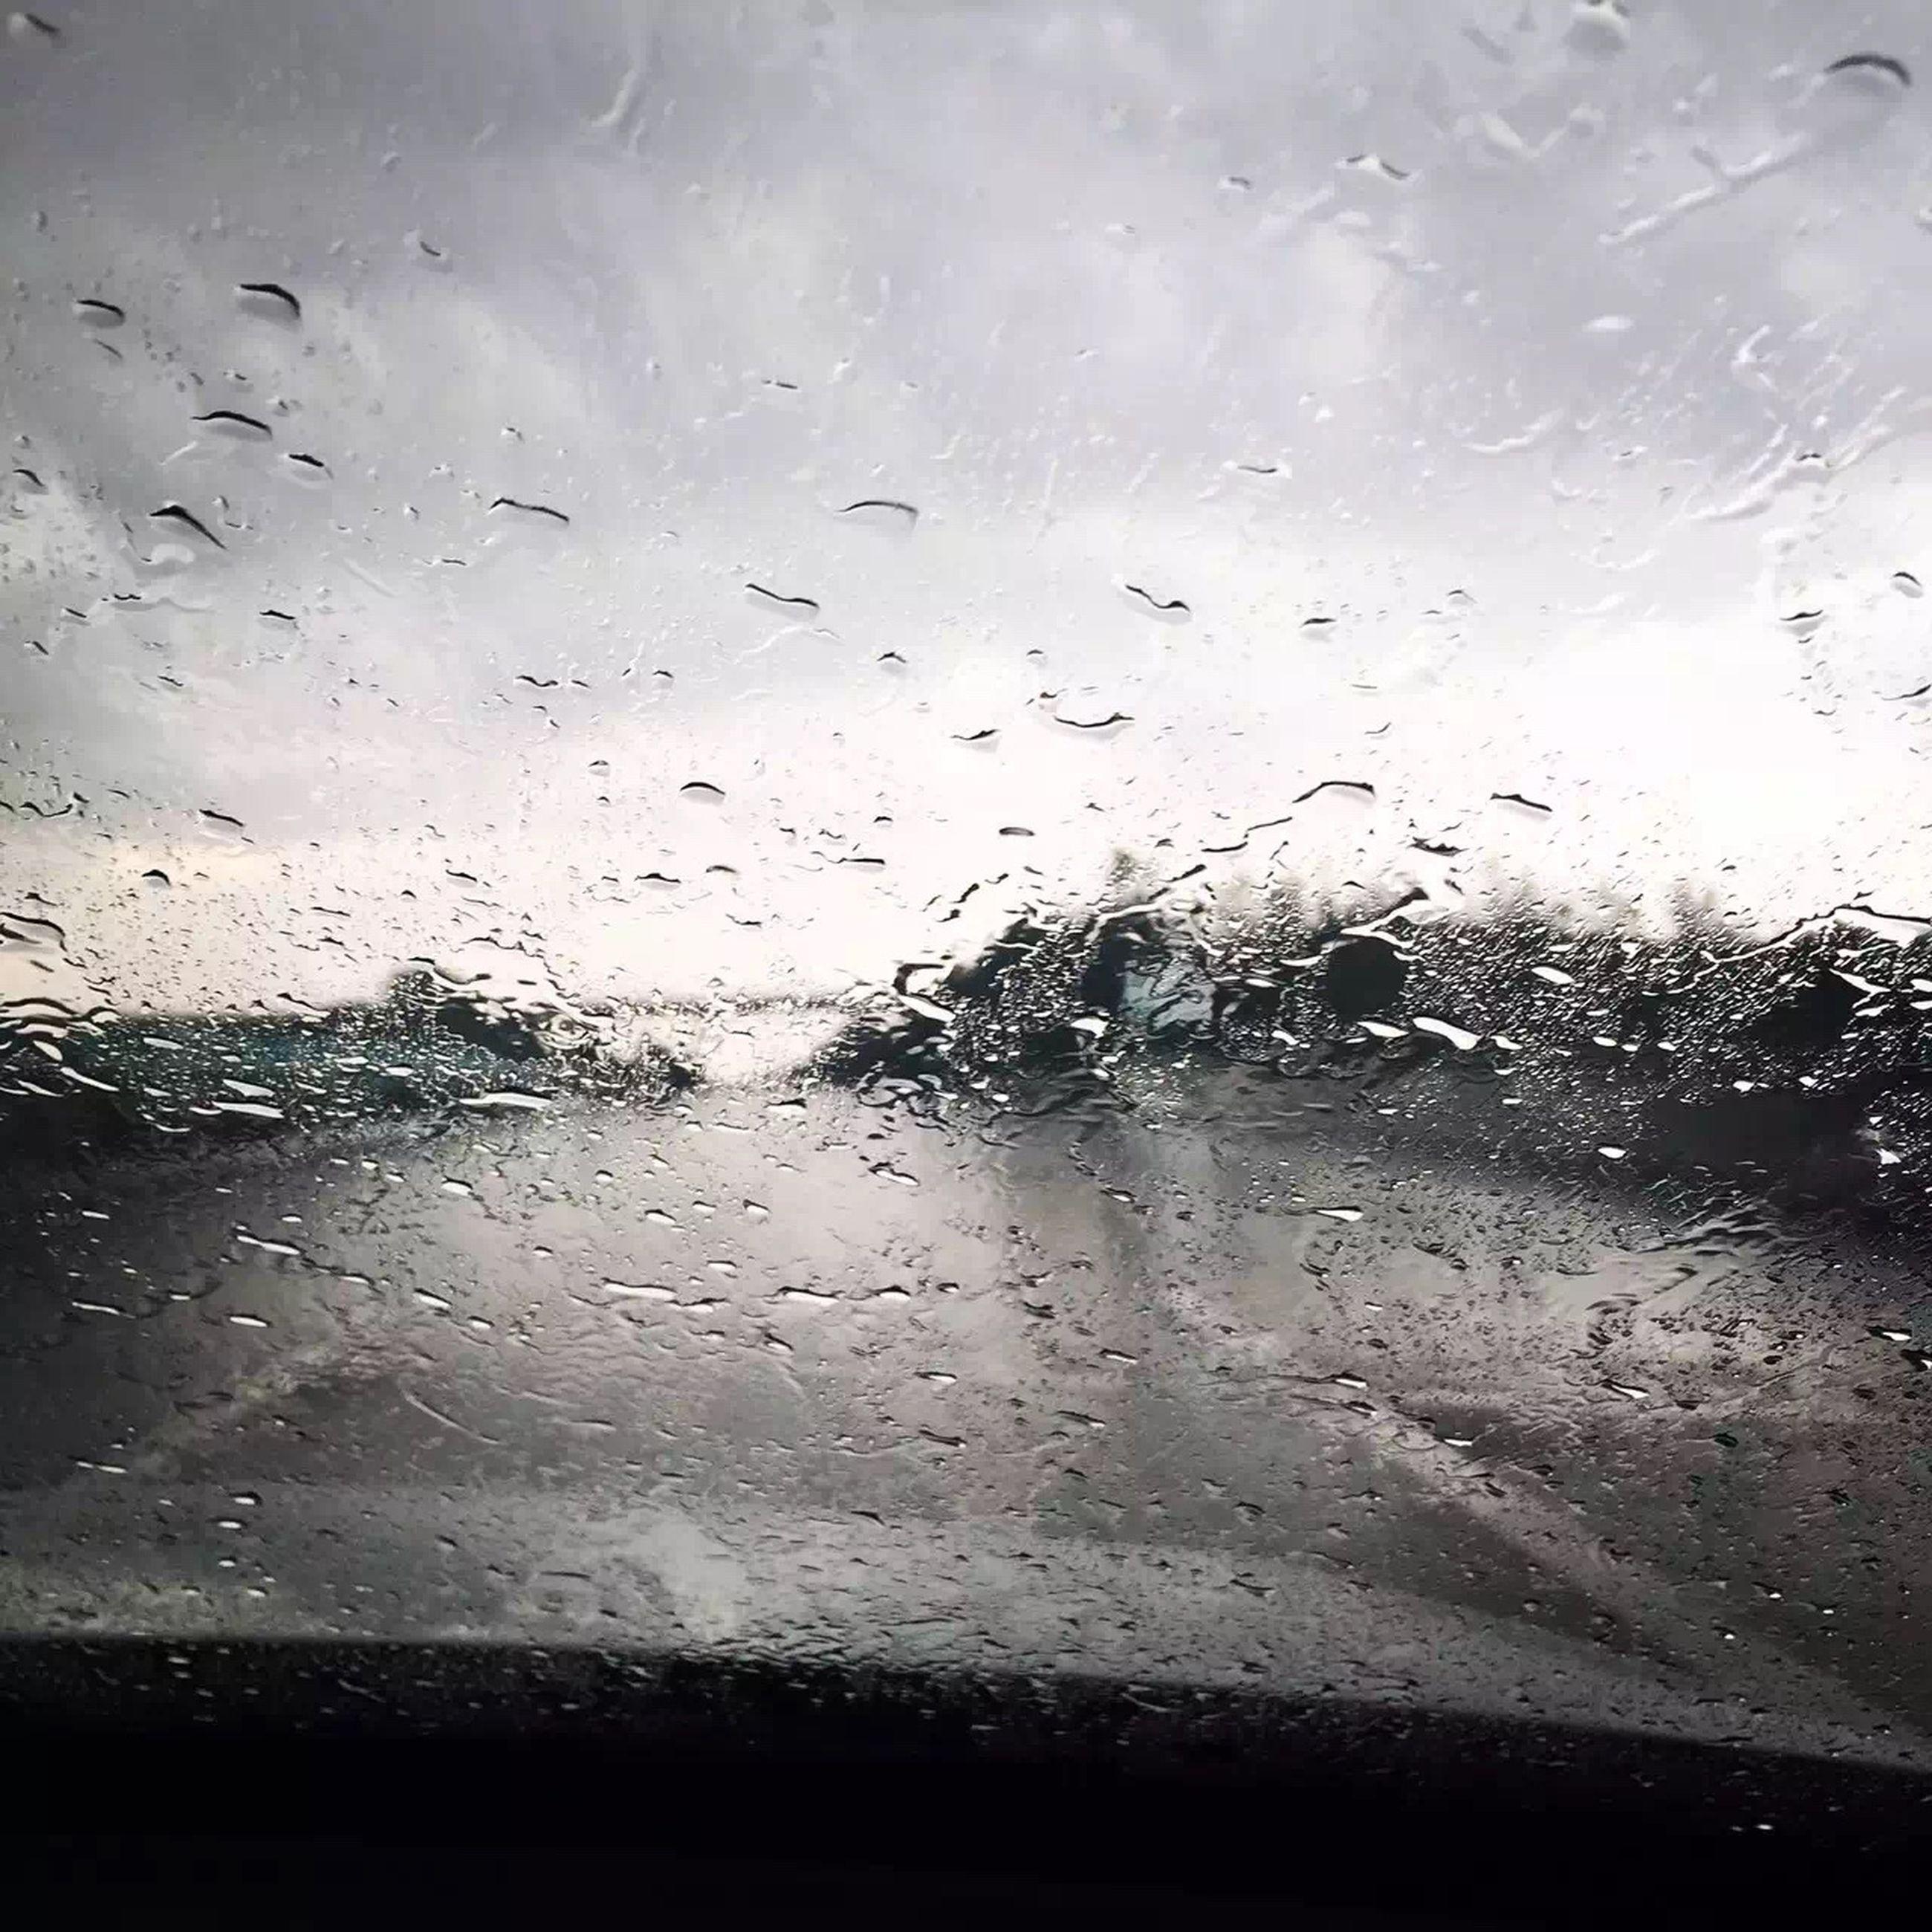 drop, wet, window, water, transparent, rain, glass - material, indoors, weather, raindrop, sky, season, glass, full frame, backgrounds, looking through window, cloud - sky, monsoon, dusk, silhouette